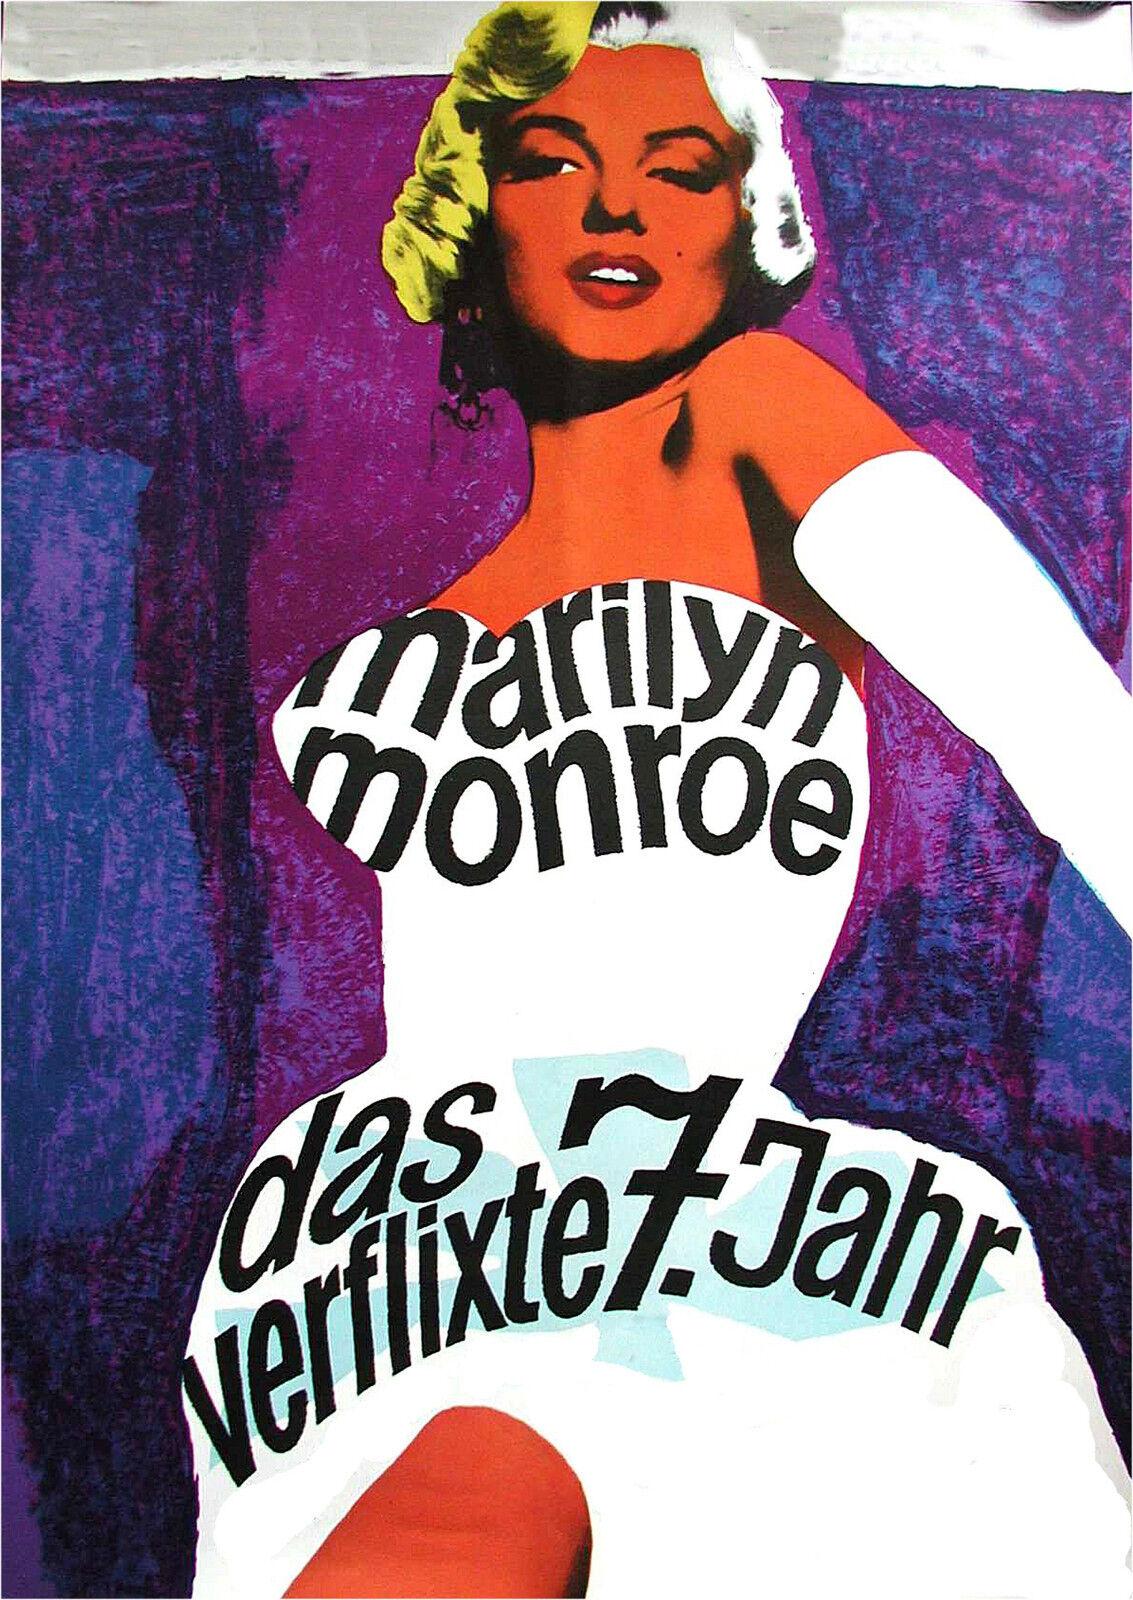 A0 Canvas street  Art graffiti print  vintage  marilyn monroe pop art painting